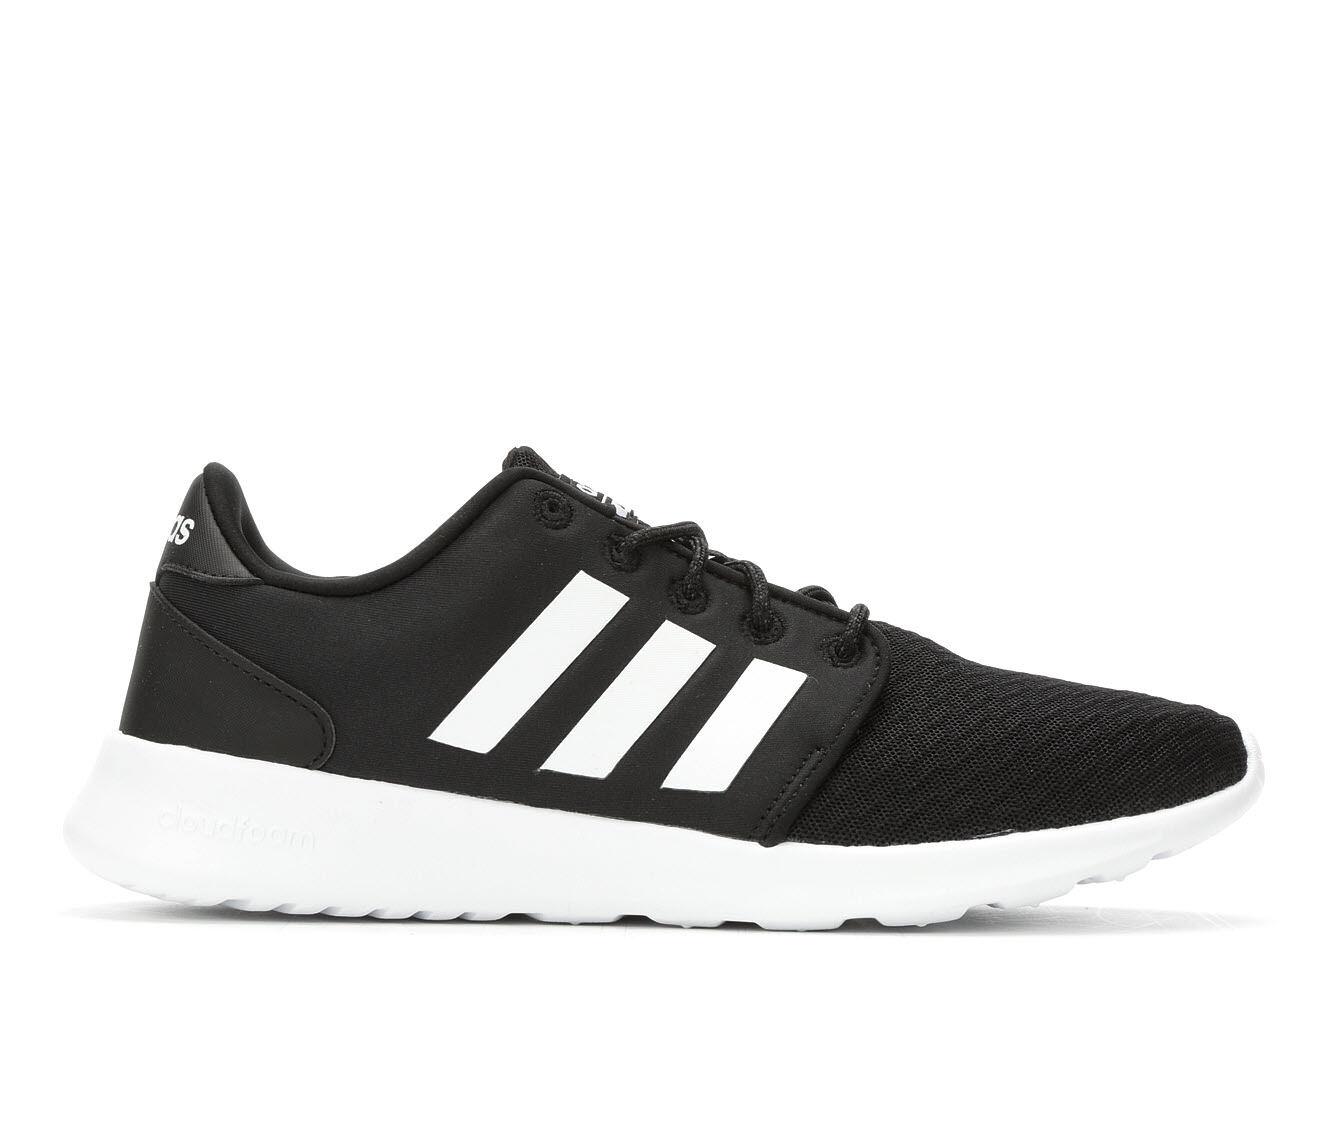 Women's Adidas Cloudfoam QT Racer Sneakers Black/Wht/Gry